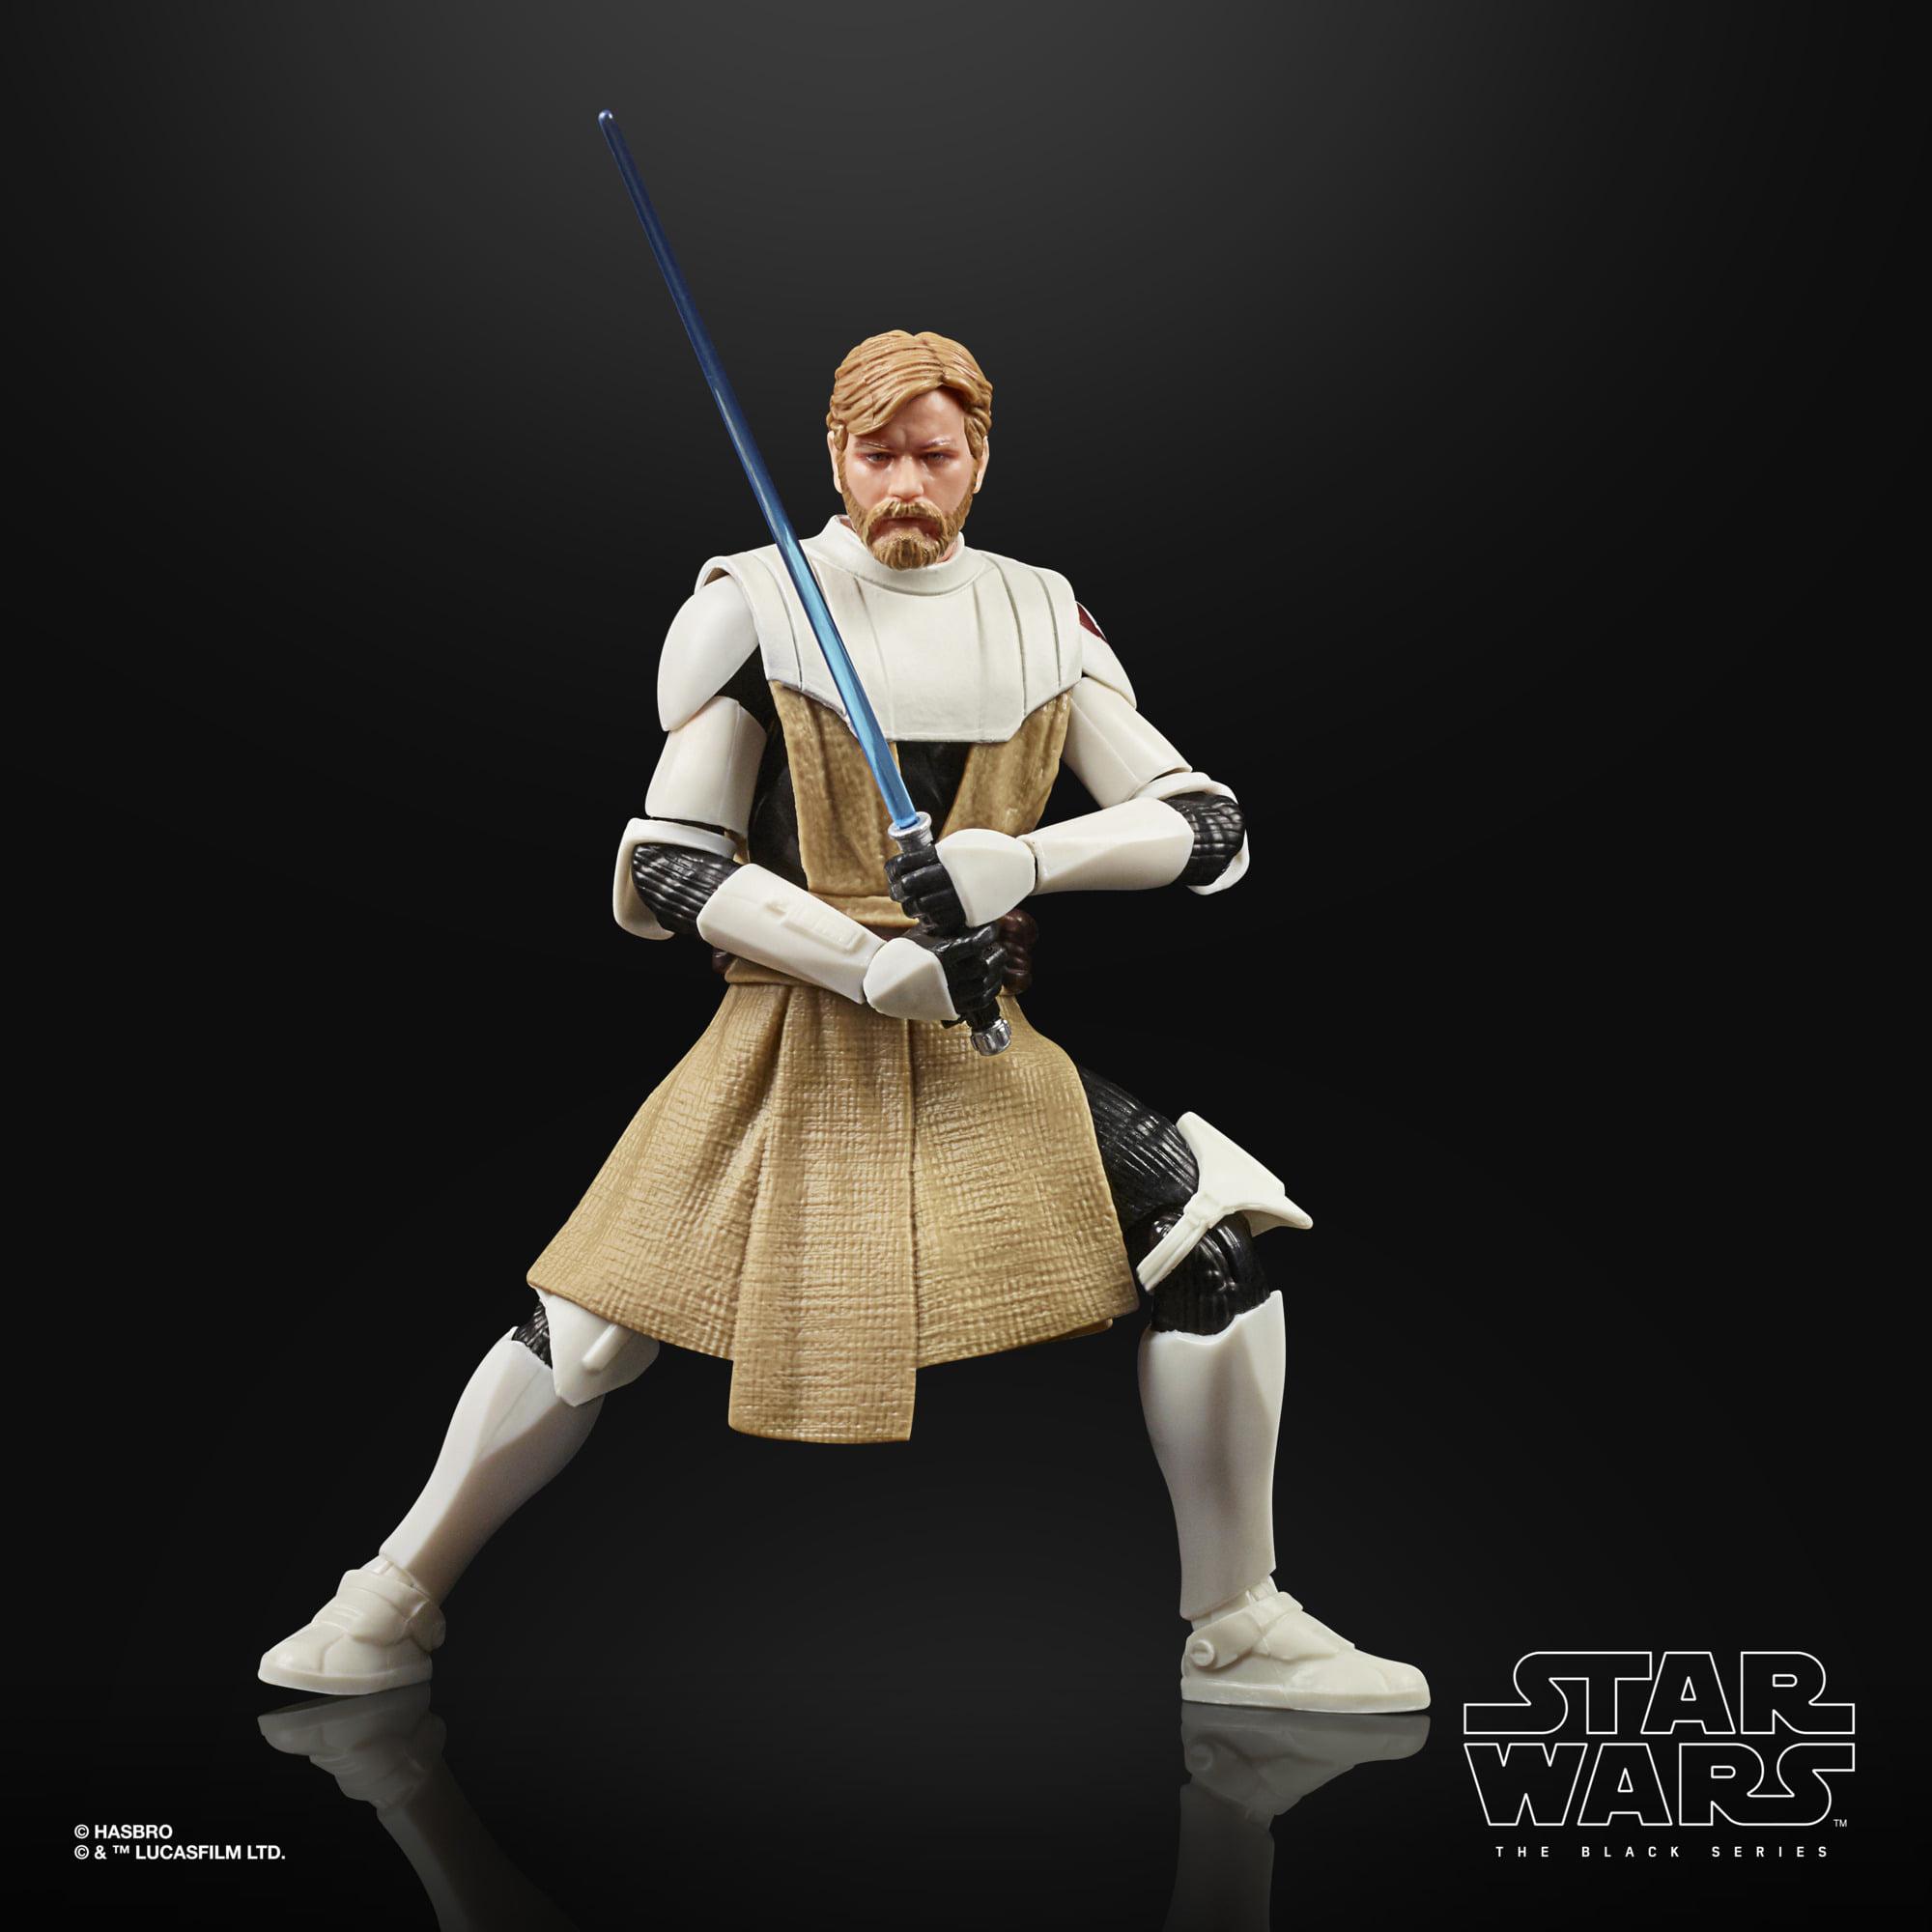 Black-Series-Obi-Wan-Kenobi-TCW-Lucasfilm-50th-Anniversary-Loose-4.jpg